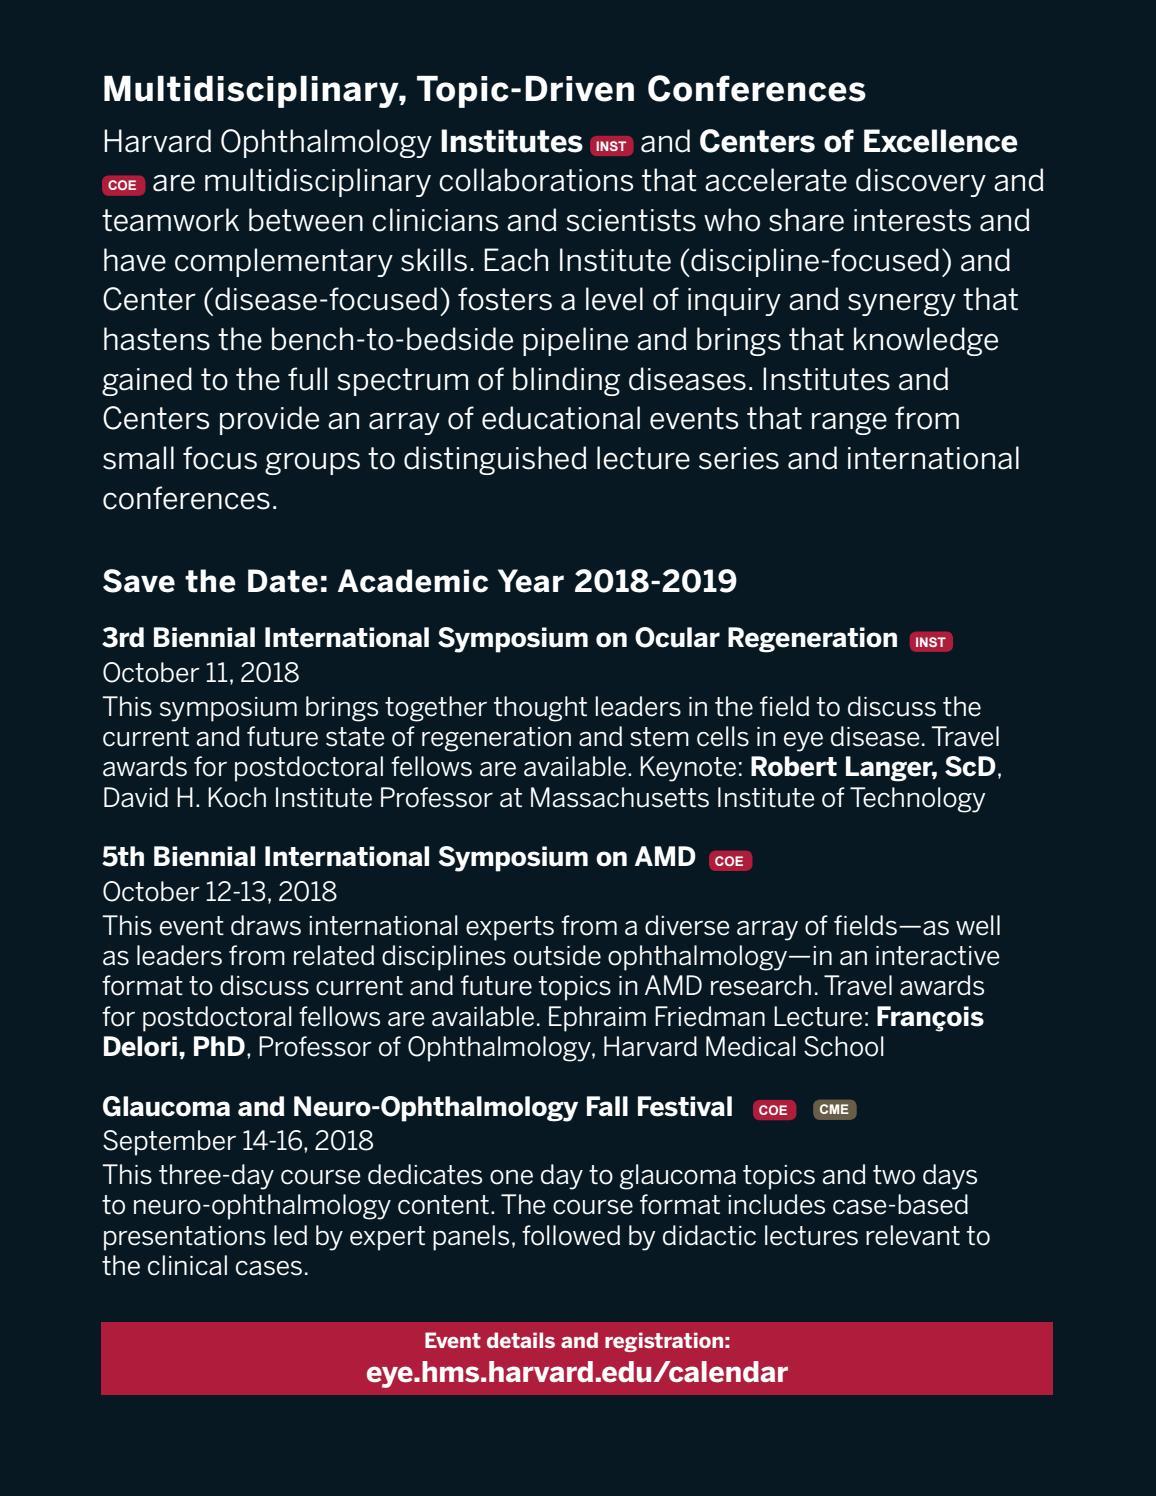 Harvard Ophthalmology Educational Calendar 2017-18 by